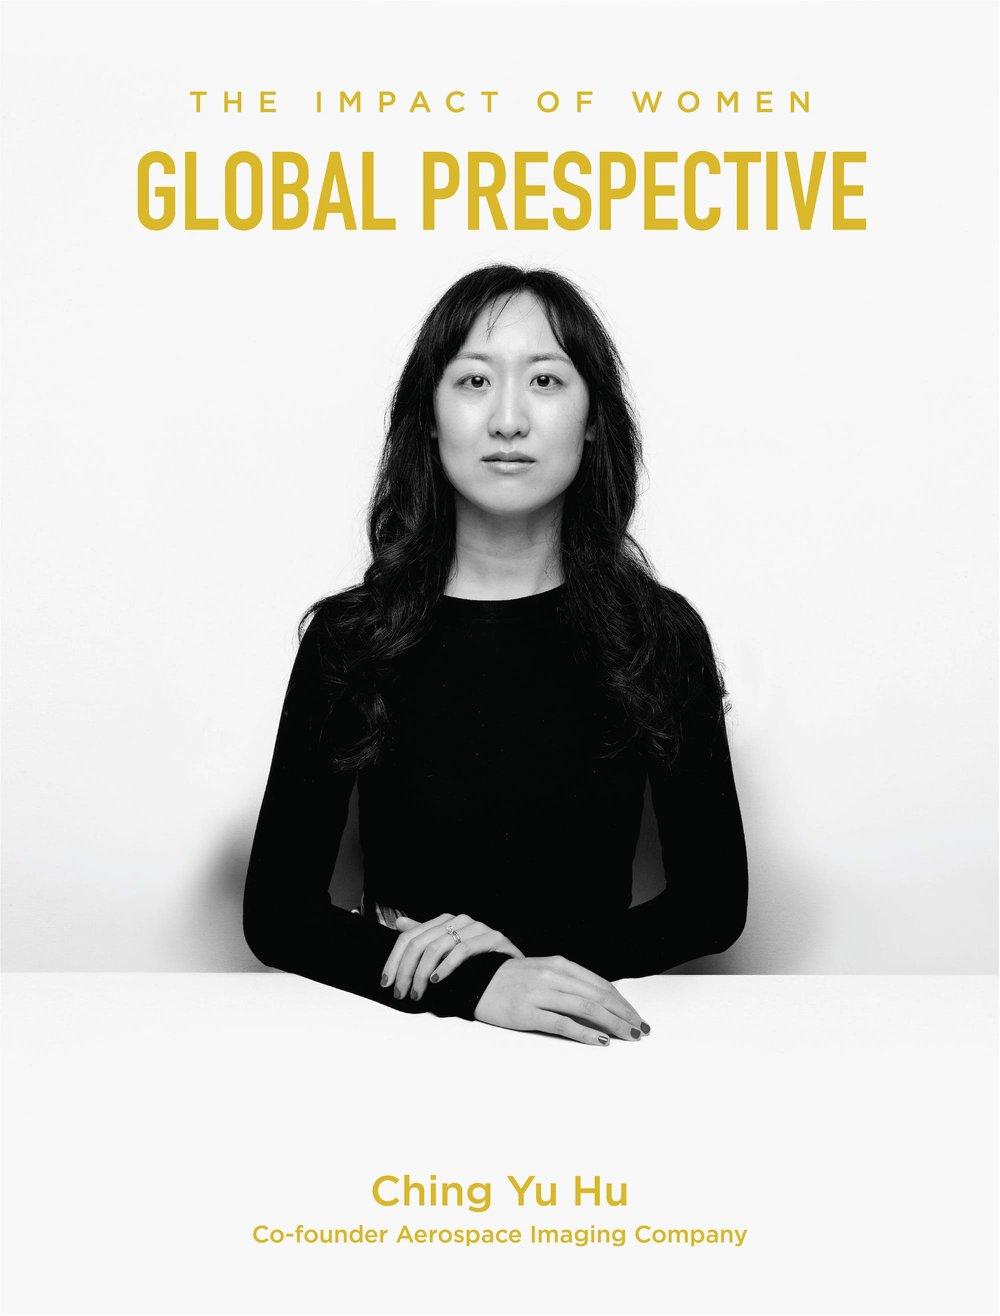 Ching Yu Hu has a Global Perspective